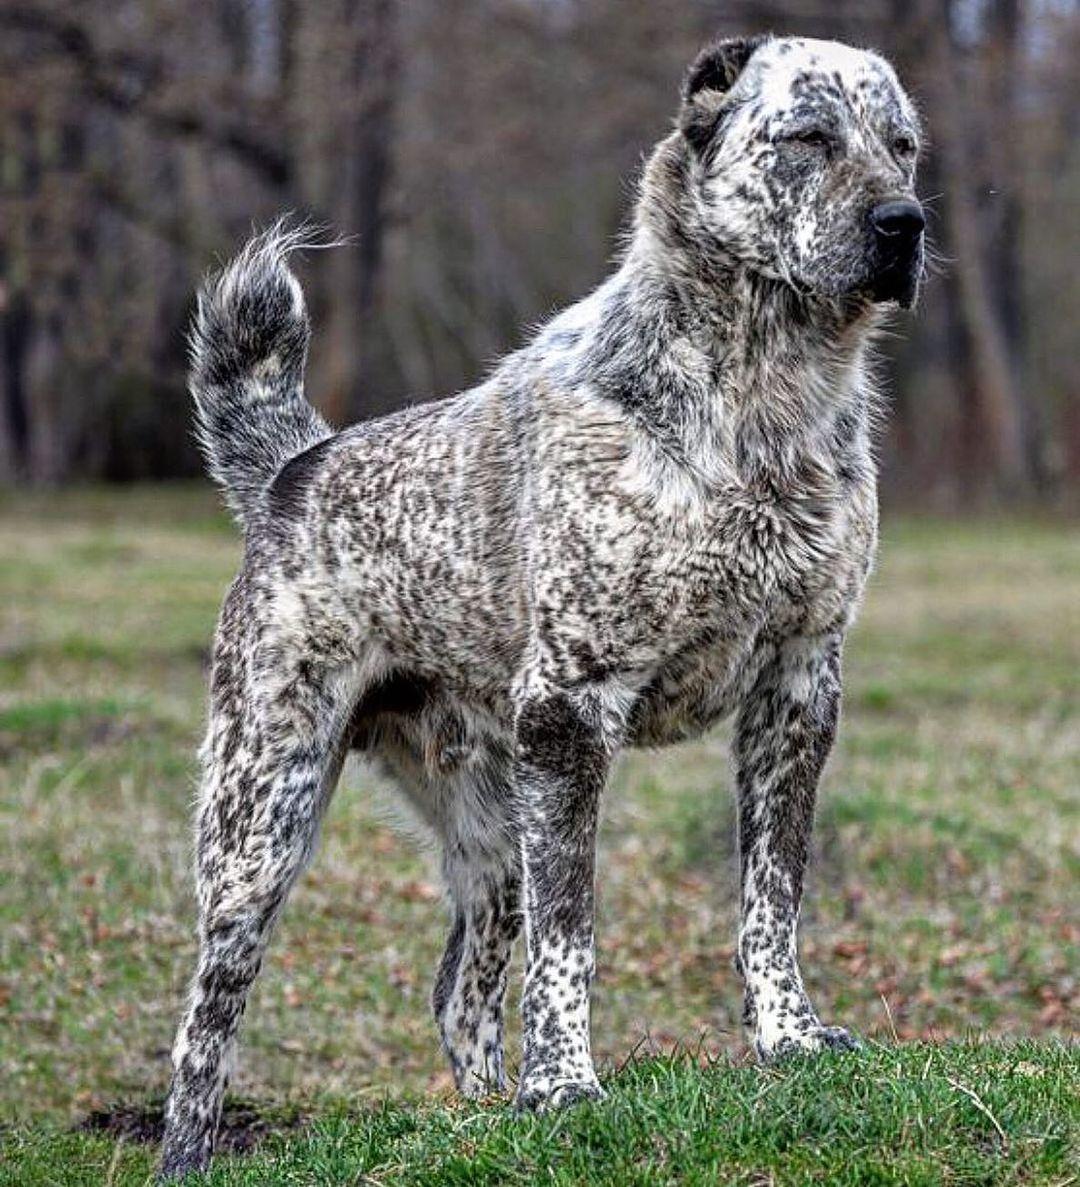 Một số ít do yếu tố di truyền ở chó Alabai